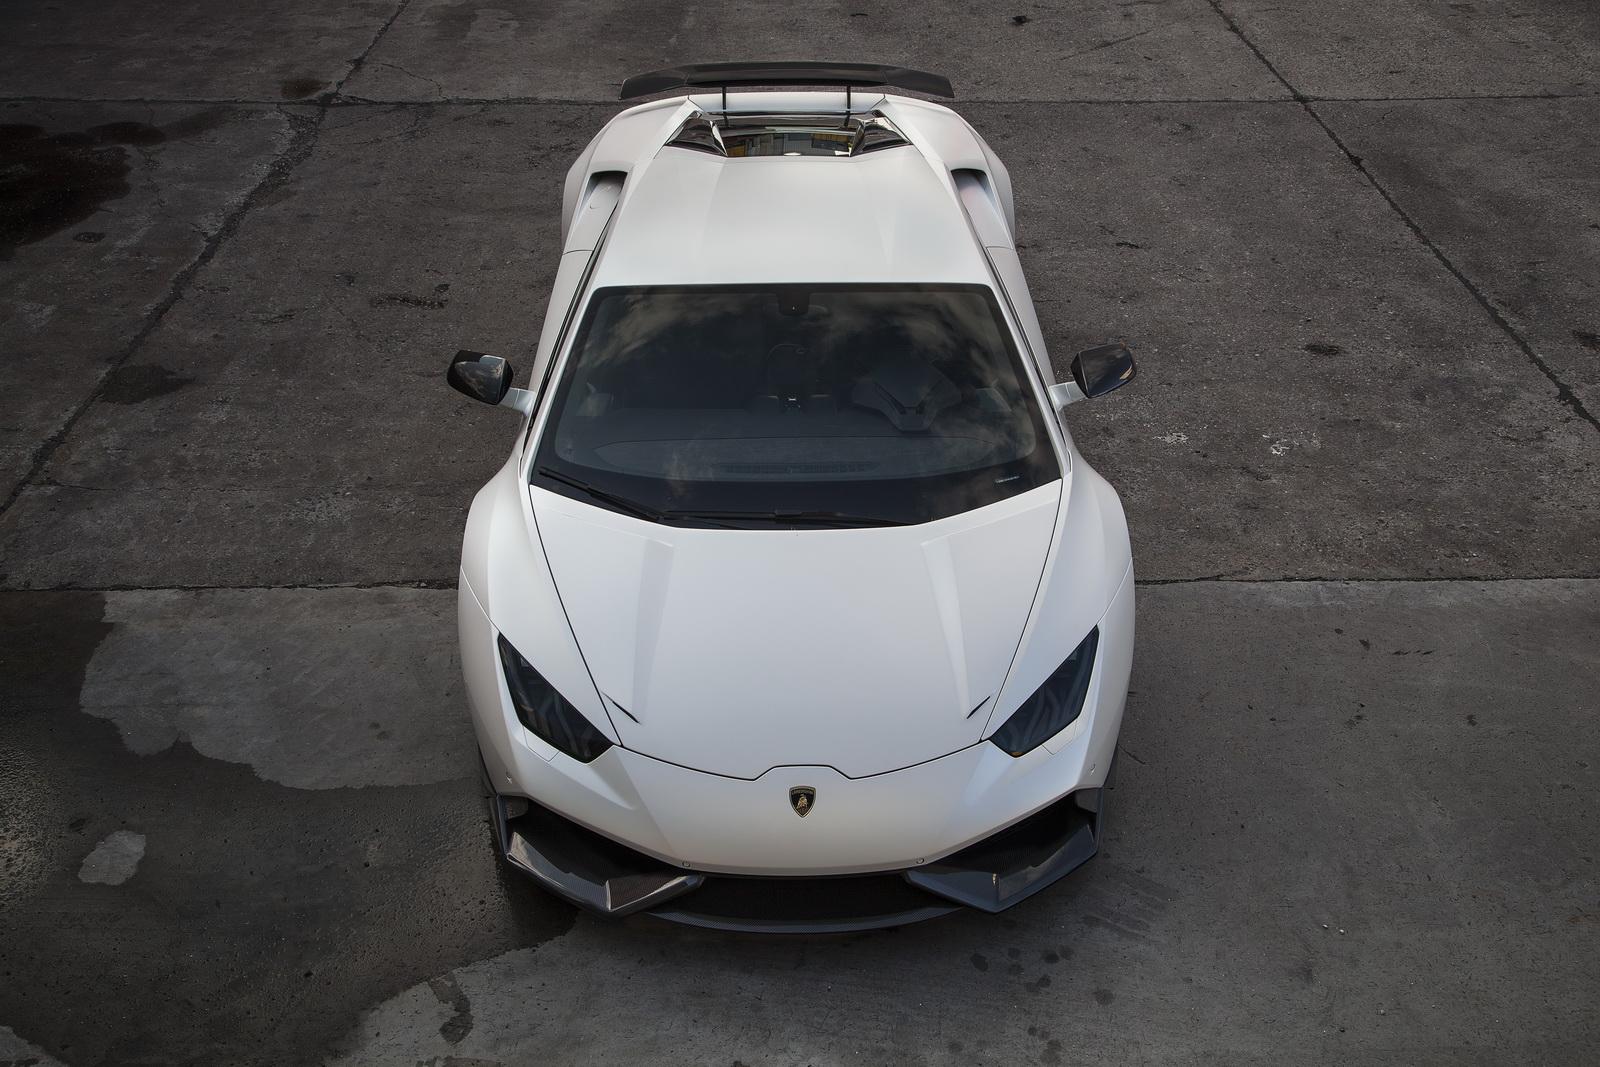 Tuner Car Wallpaper Hd Novitec Torado Gives Lamborghini Huracan A Sexy Suit Of